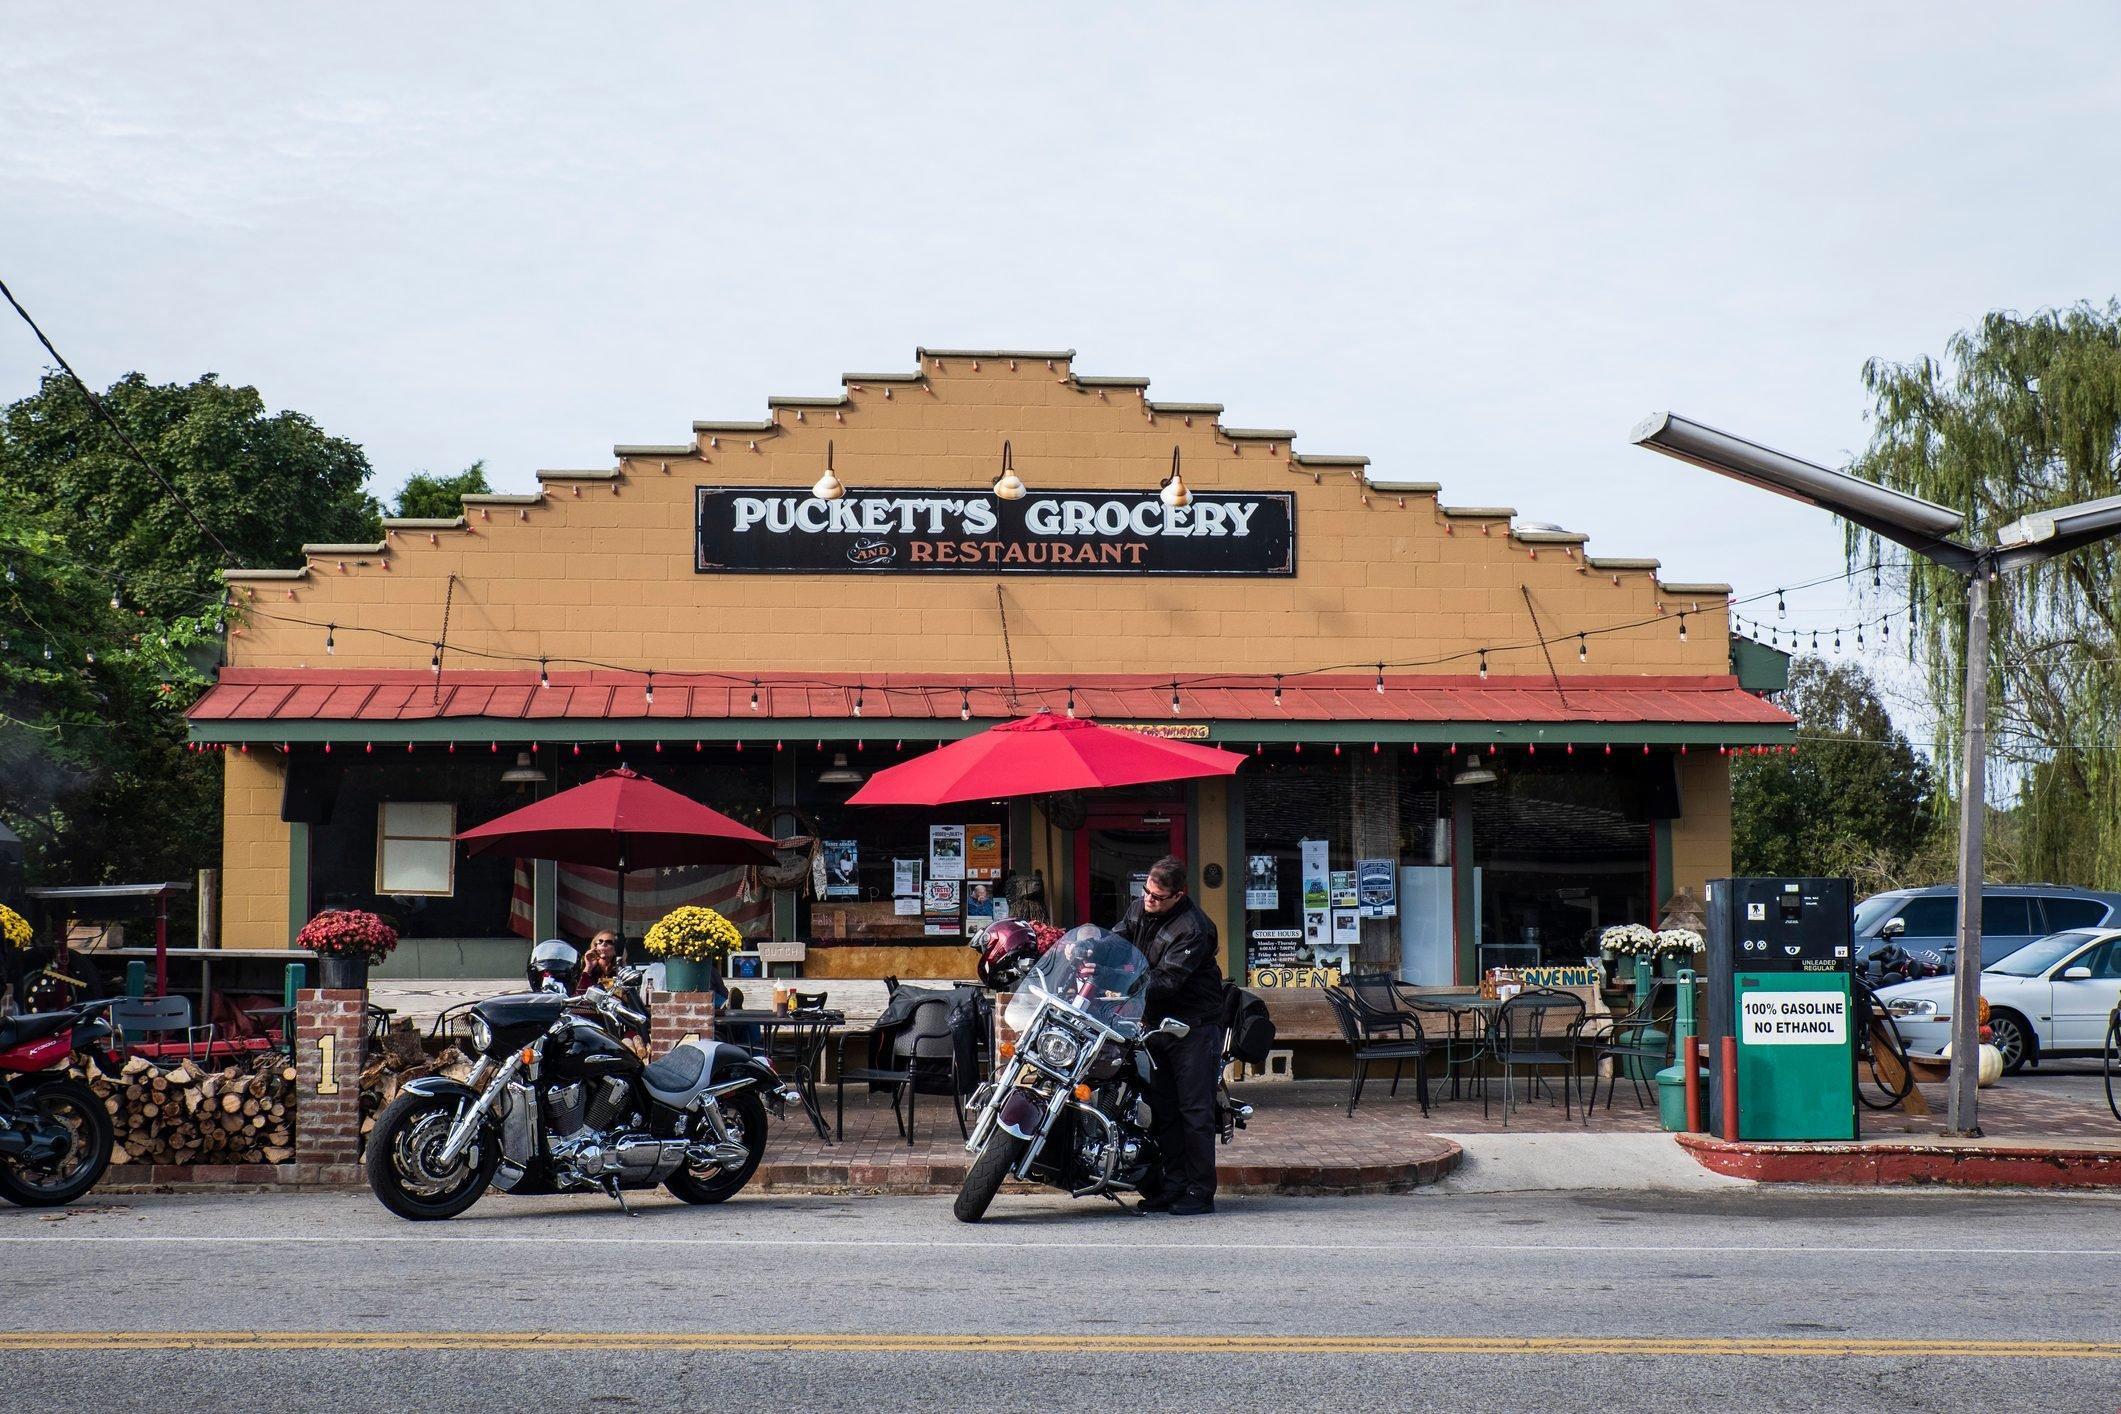 Puckett's Grocery in Leiper's Fork, TN